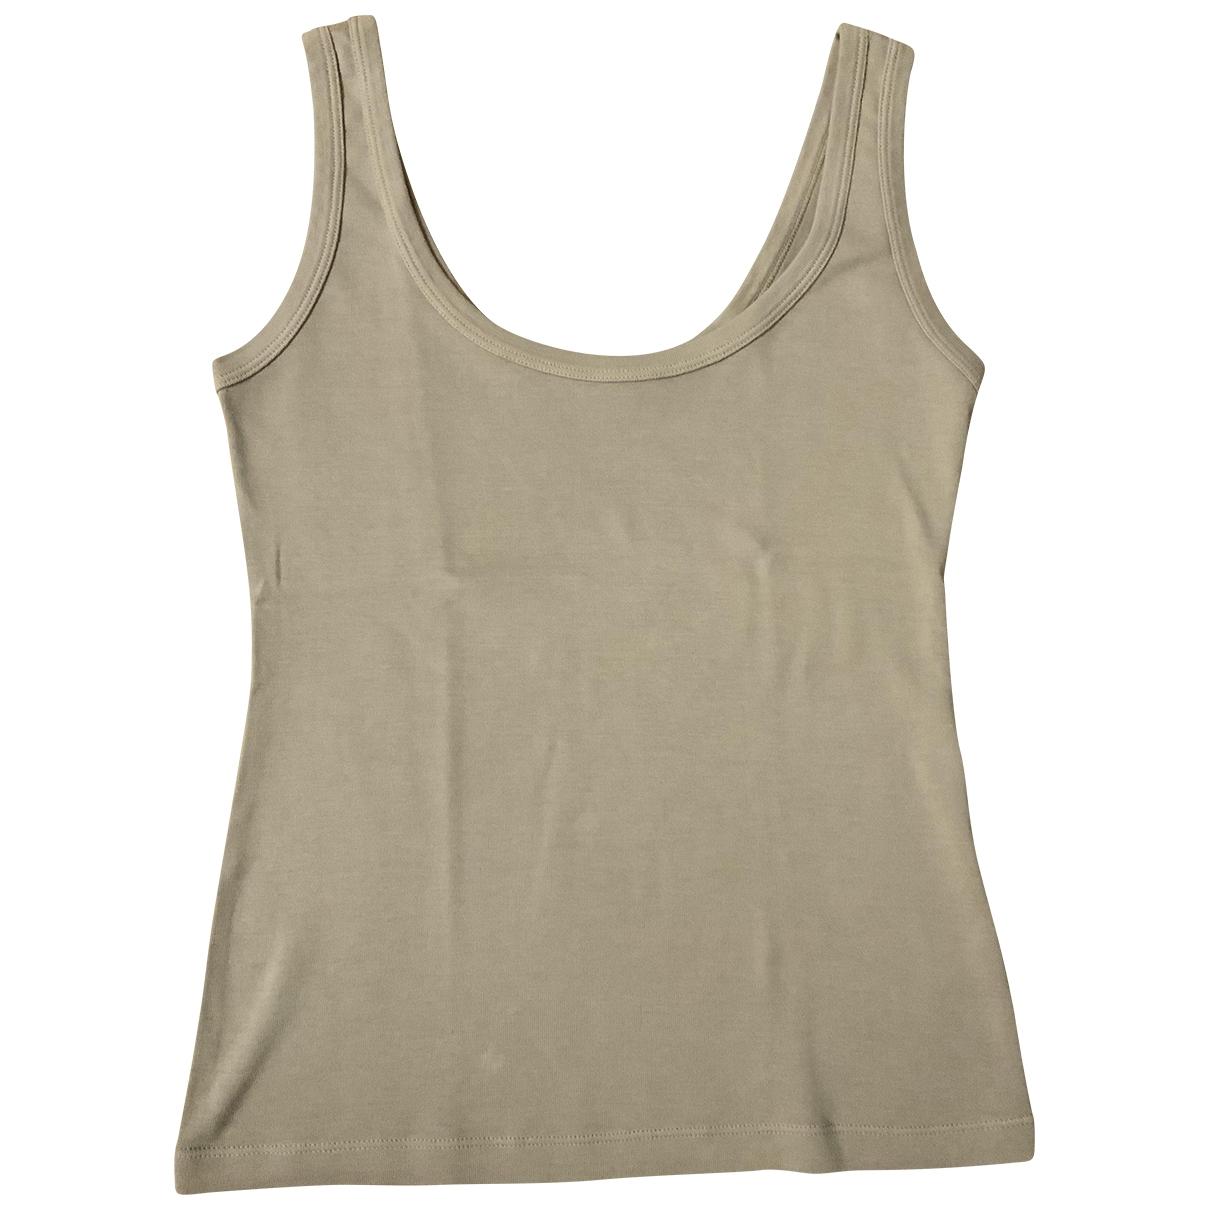 Aspesi \N Beige Cotton  top for Women S International